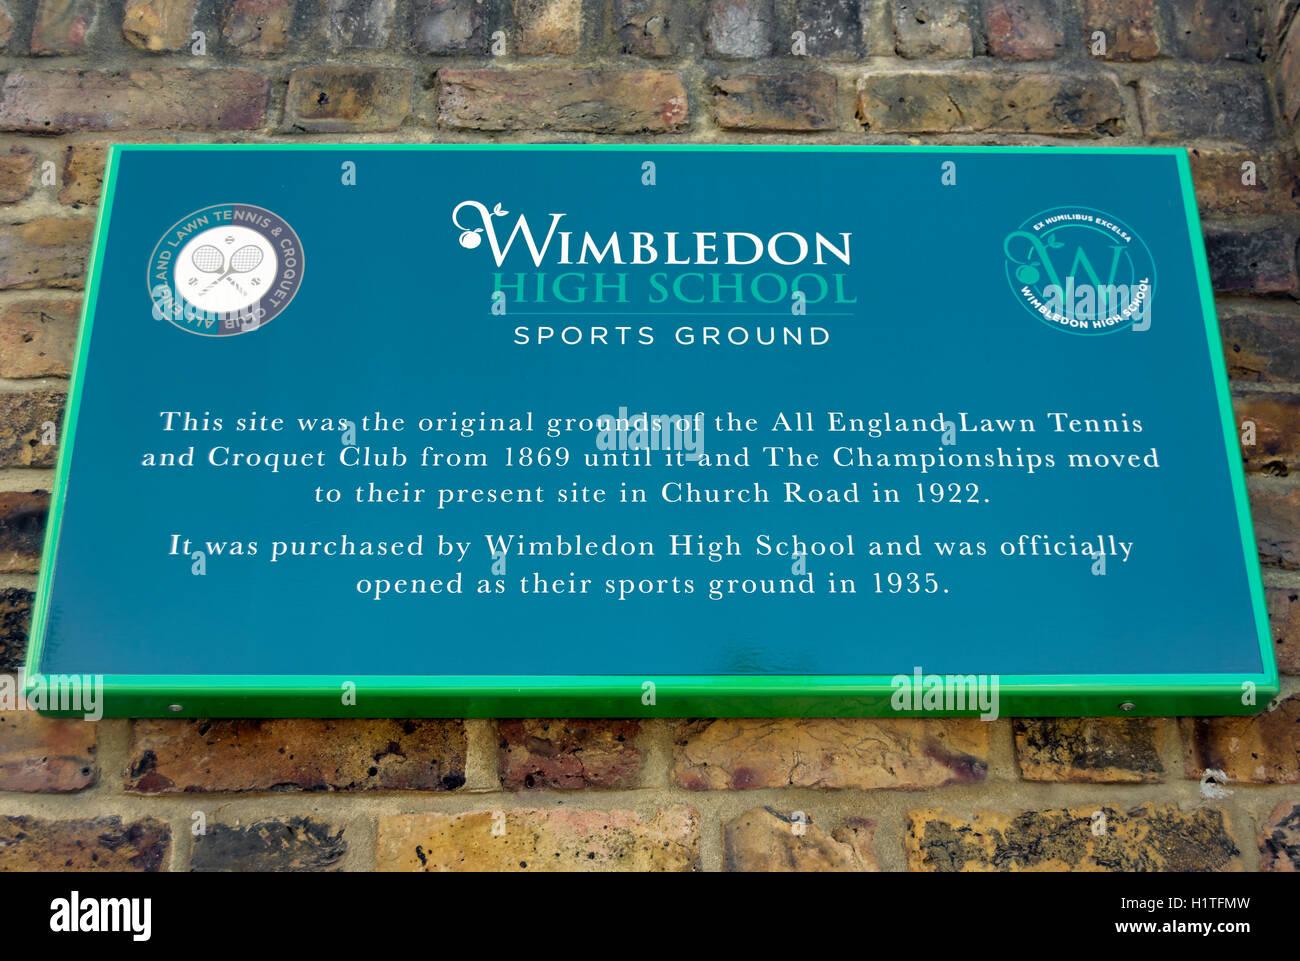 Commemorative Sch | Commemorative Plaque At Wimbledon High School Sports Ground Marking